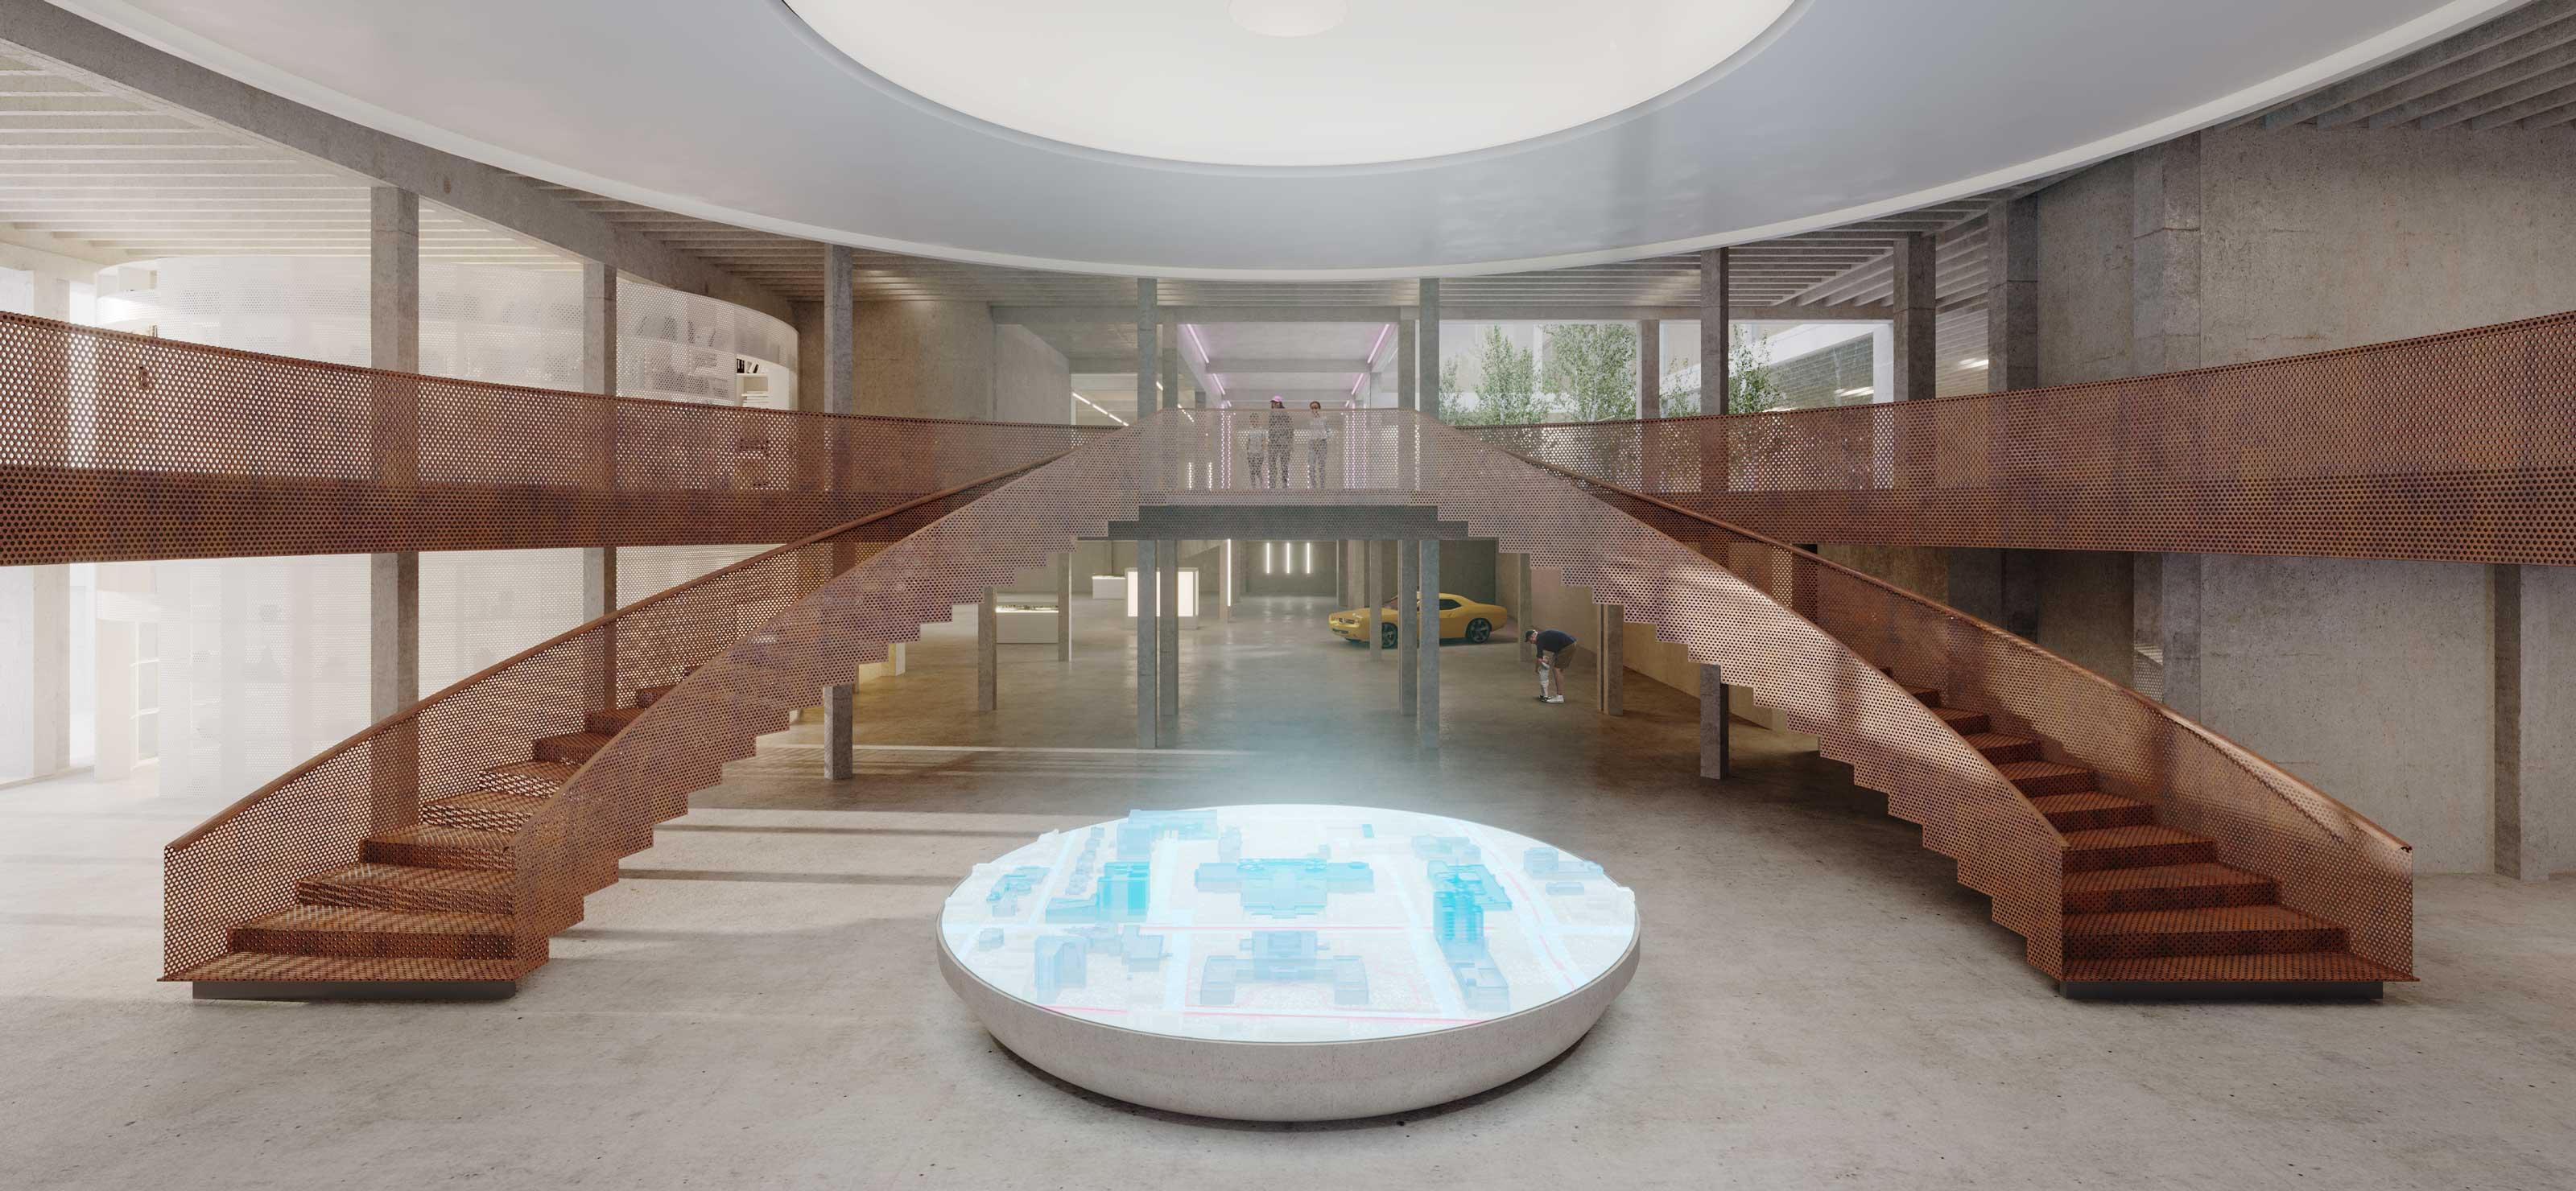 architecture interior concrete brutalist detroit